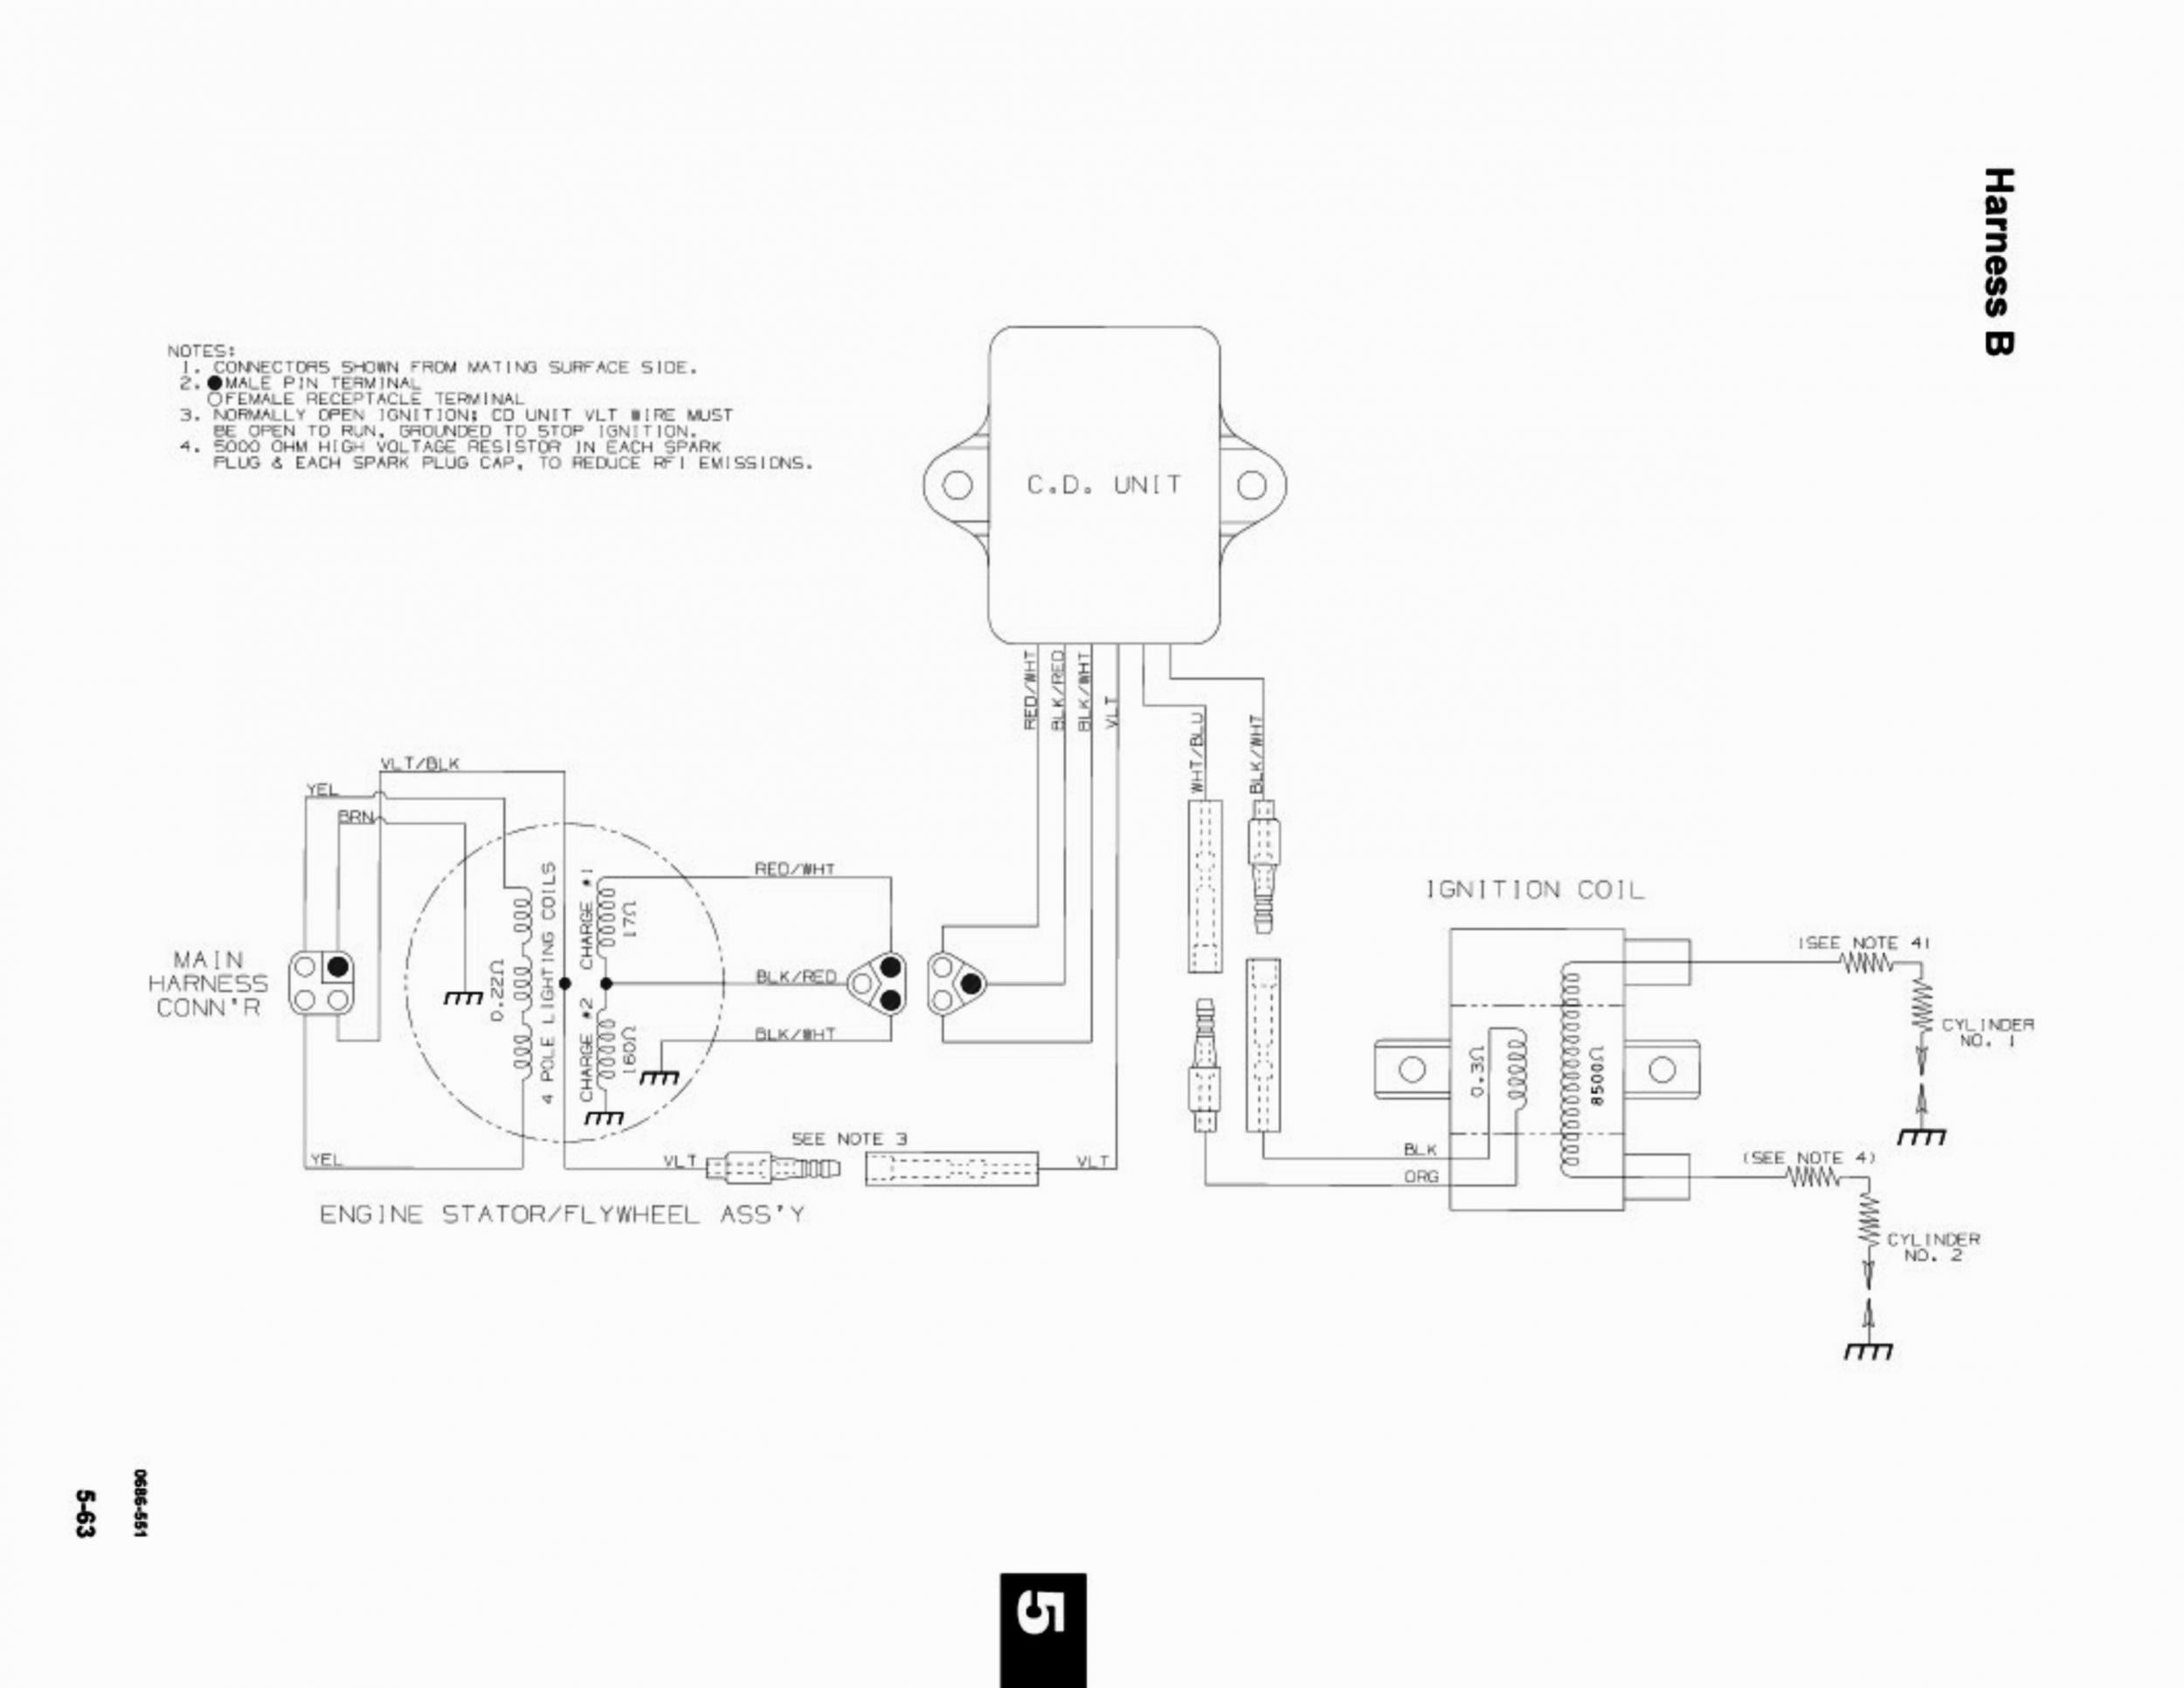 wiring diagram arctic cat z440 wiring diagram database Arctic Cat Clothing arctic cat z 440 wiring diagram wiring diagram 95 arctic cat panther 440 wiring diagram arctic cat z440